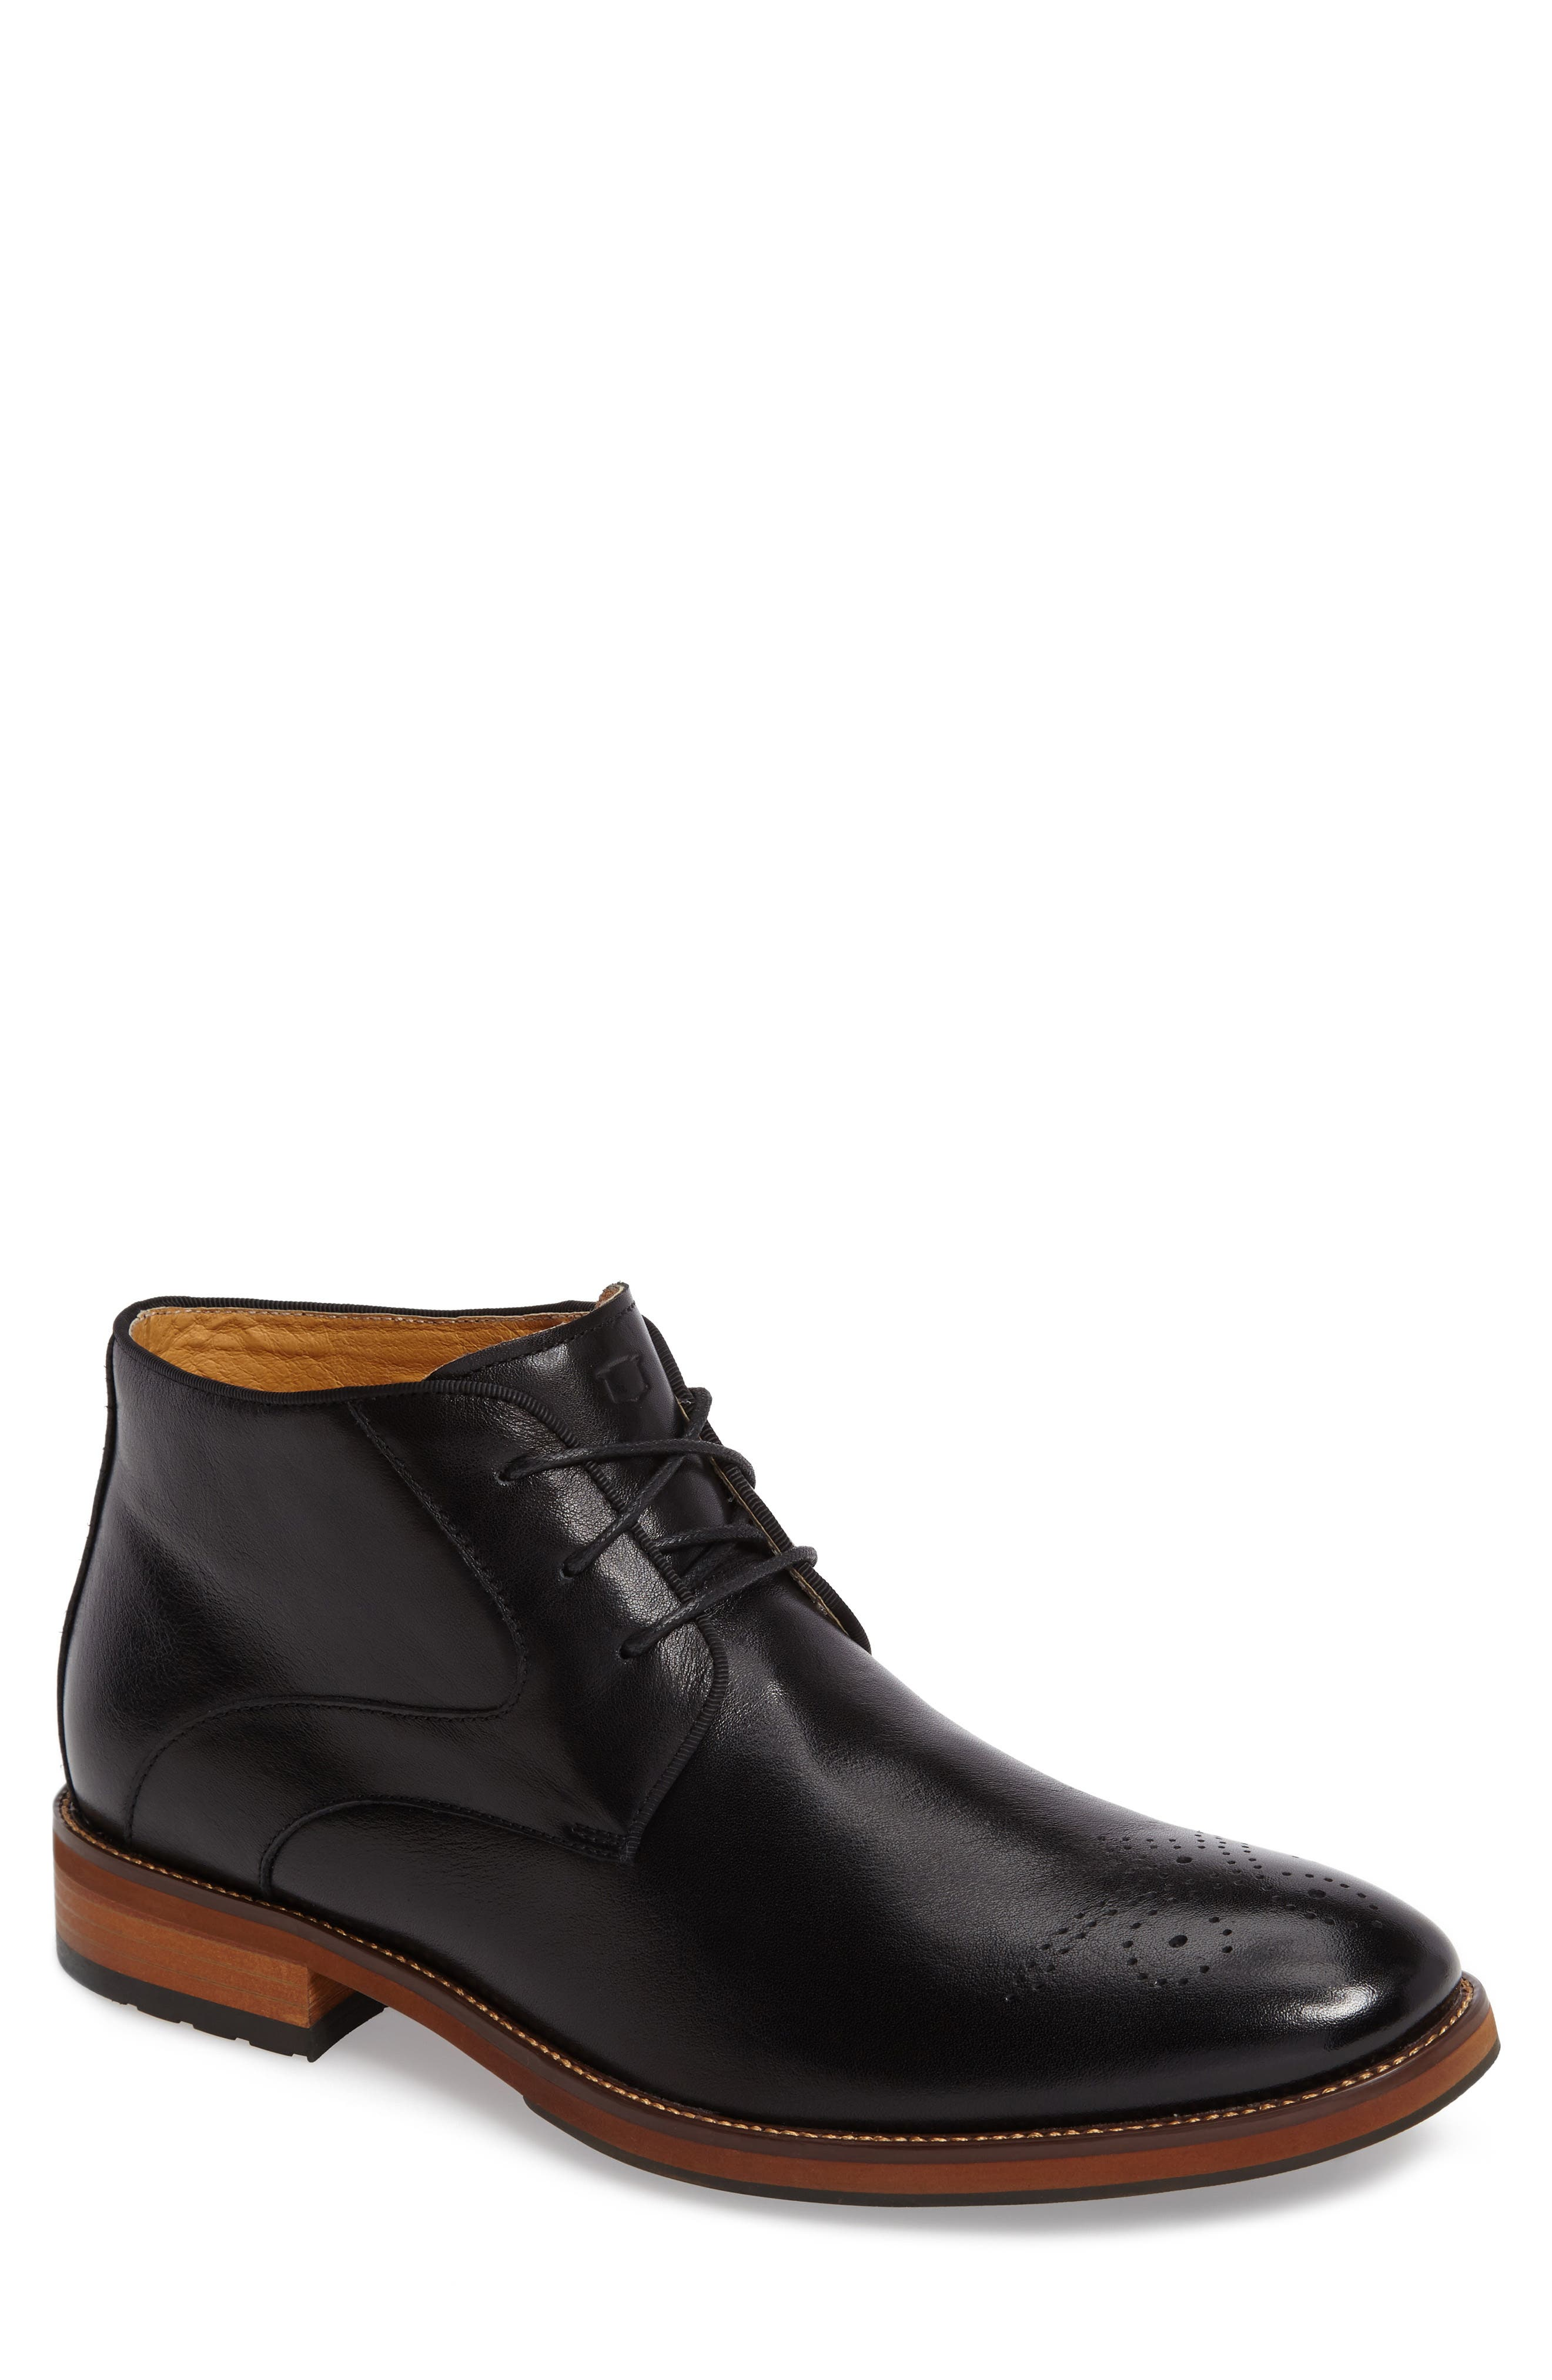 FLORSHEIM Blaze Chukka Boot, Main, color, BLACK LEATHER